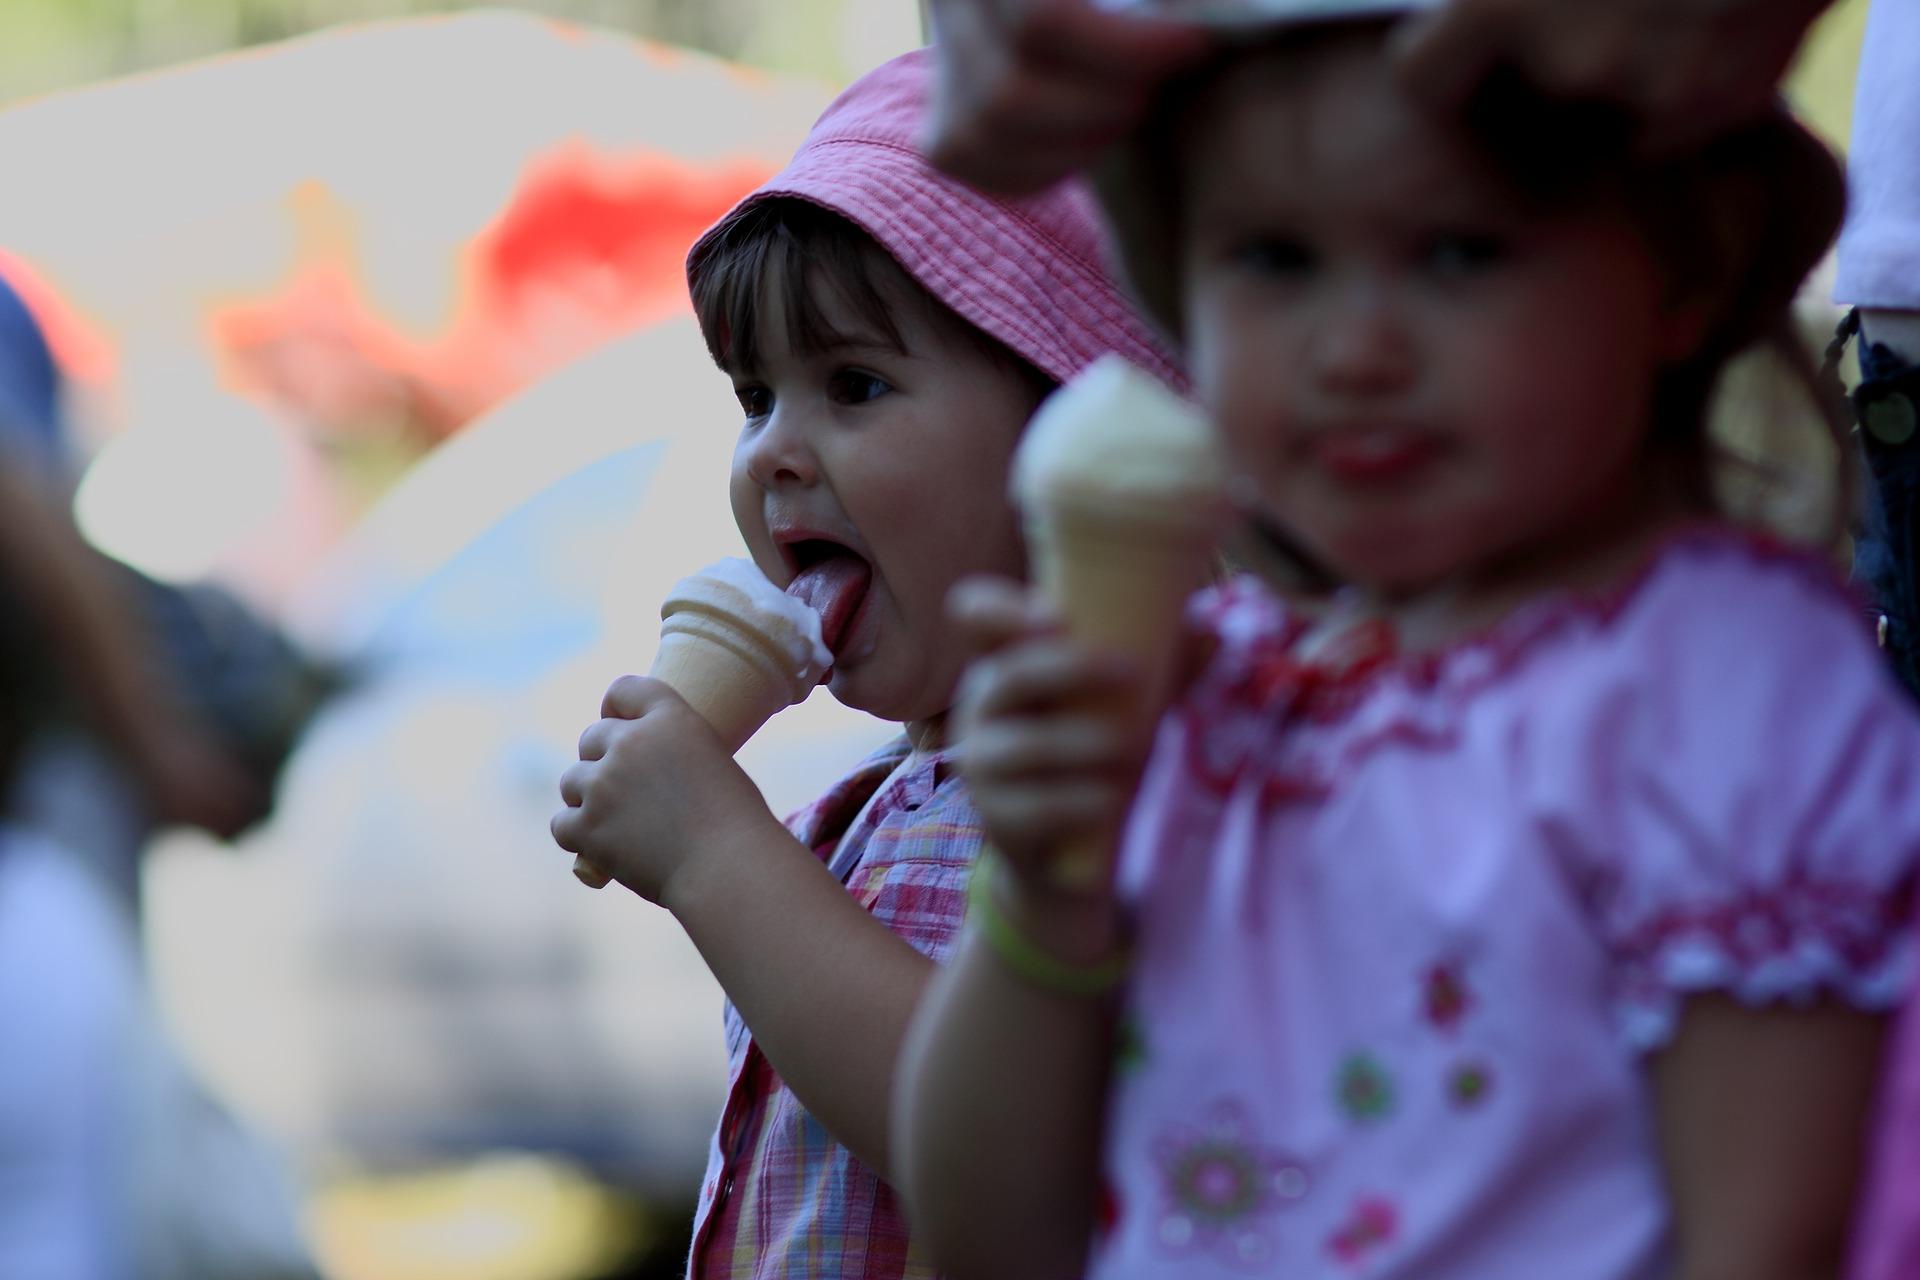 Little Girls Eating Ice Cream   Kids Car Donations